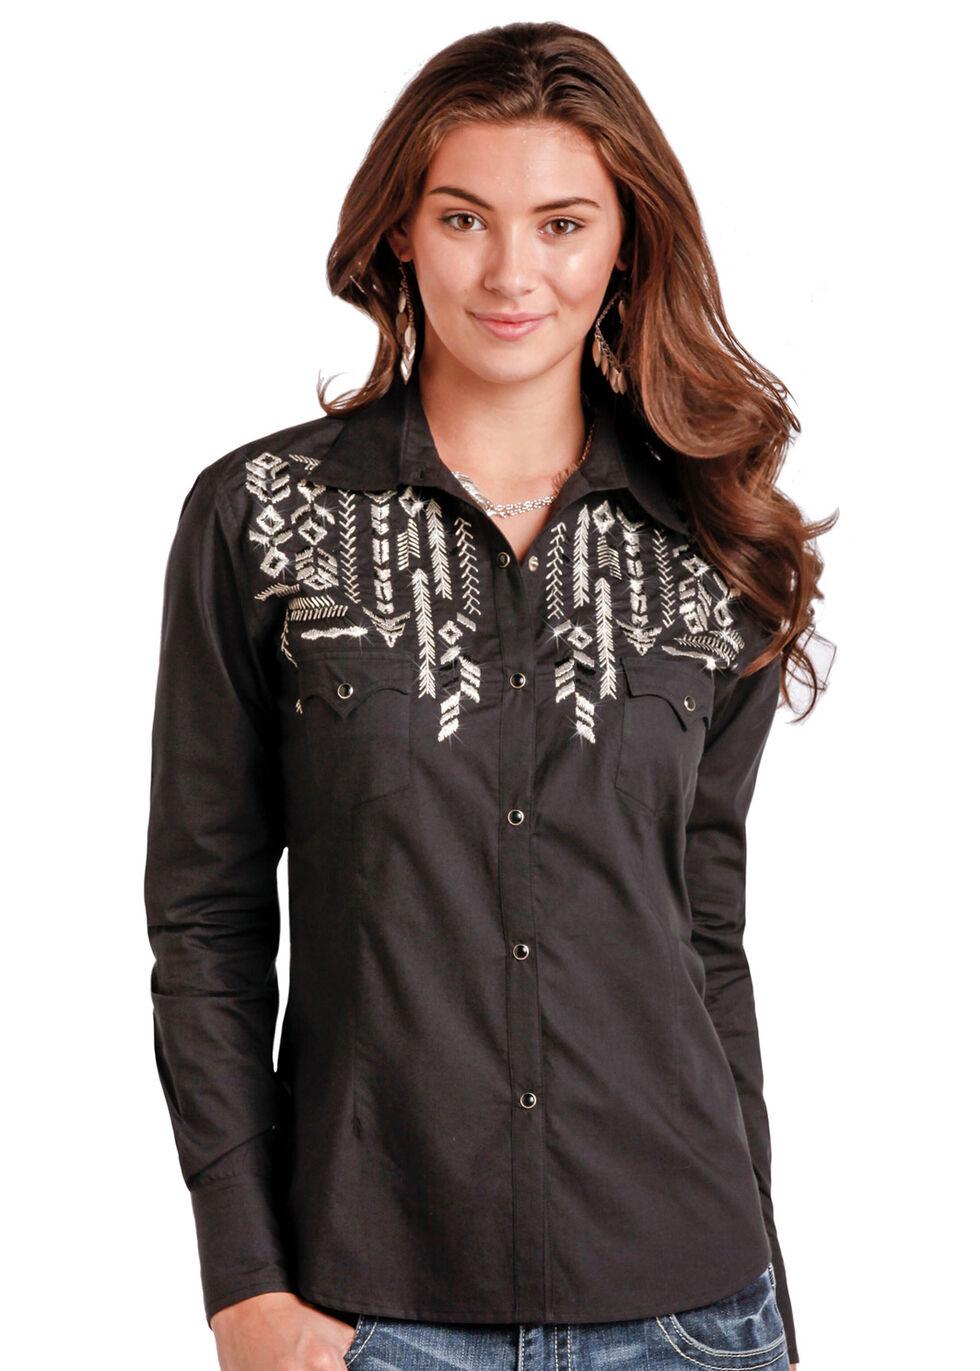 Panhandle Slim Women's Black Long Sleeve Two Pocket Shirt - Plus Size, Black, hi-res